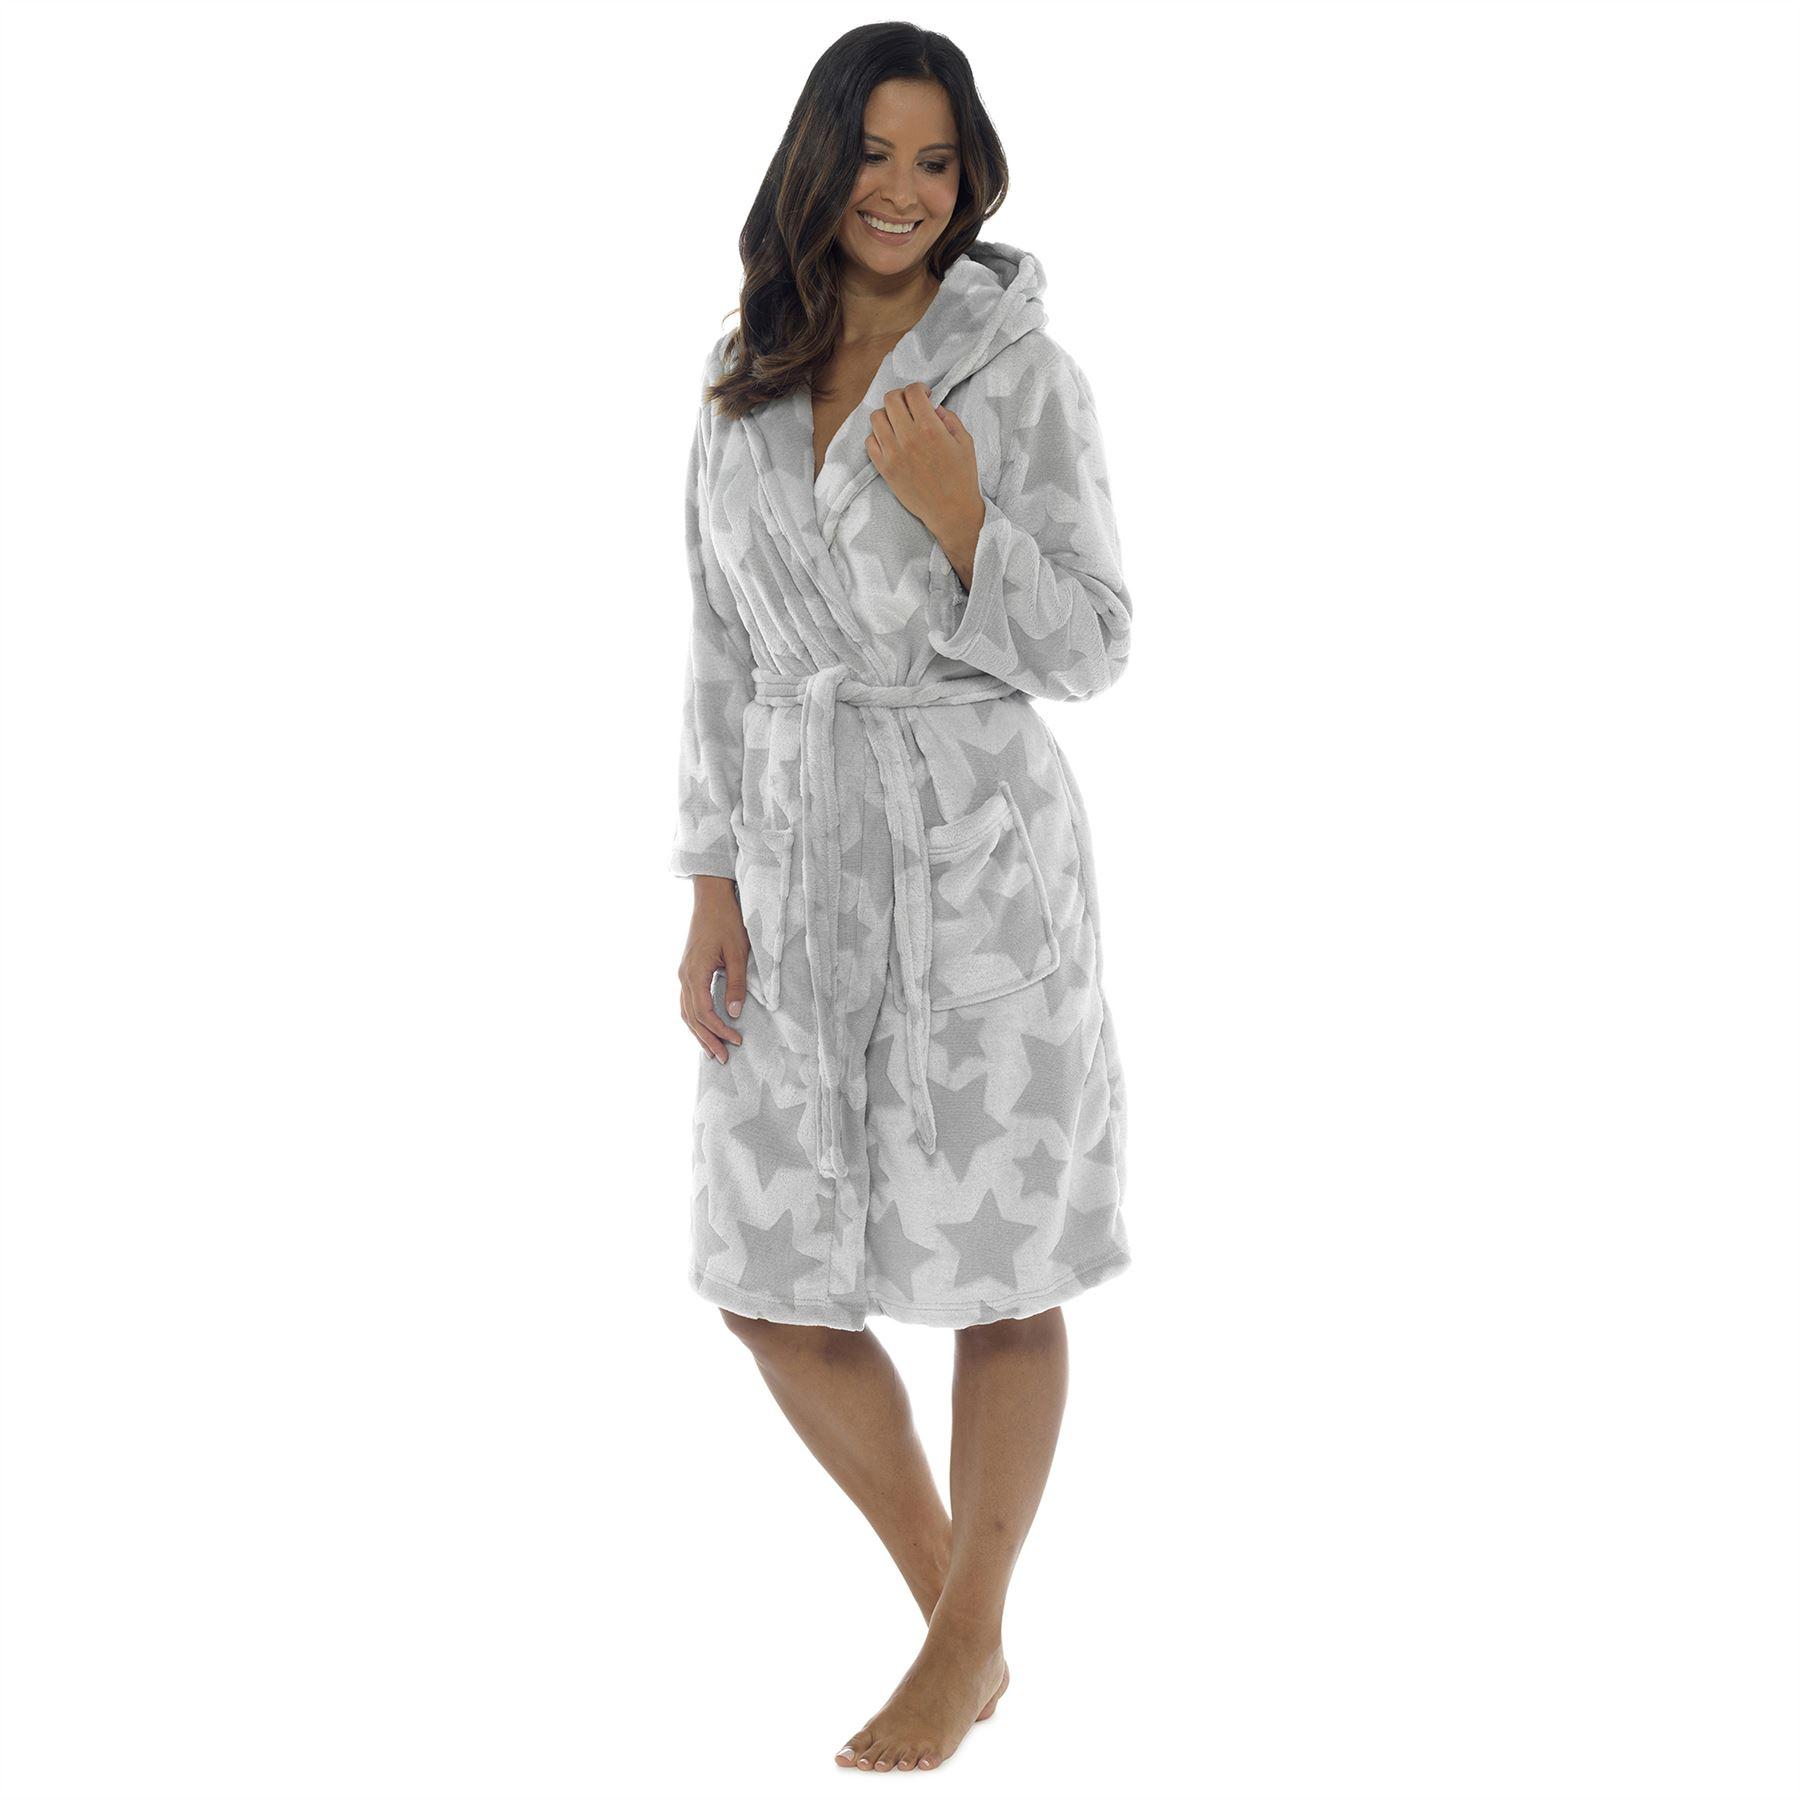 8339002210 Womens Ladies Dressing Gown Hooded Star Print Snuggle Fleece Soft ...